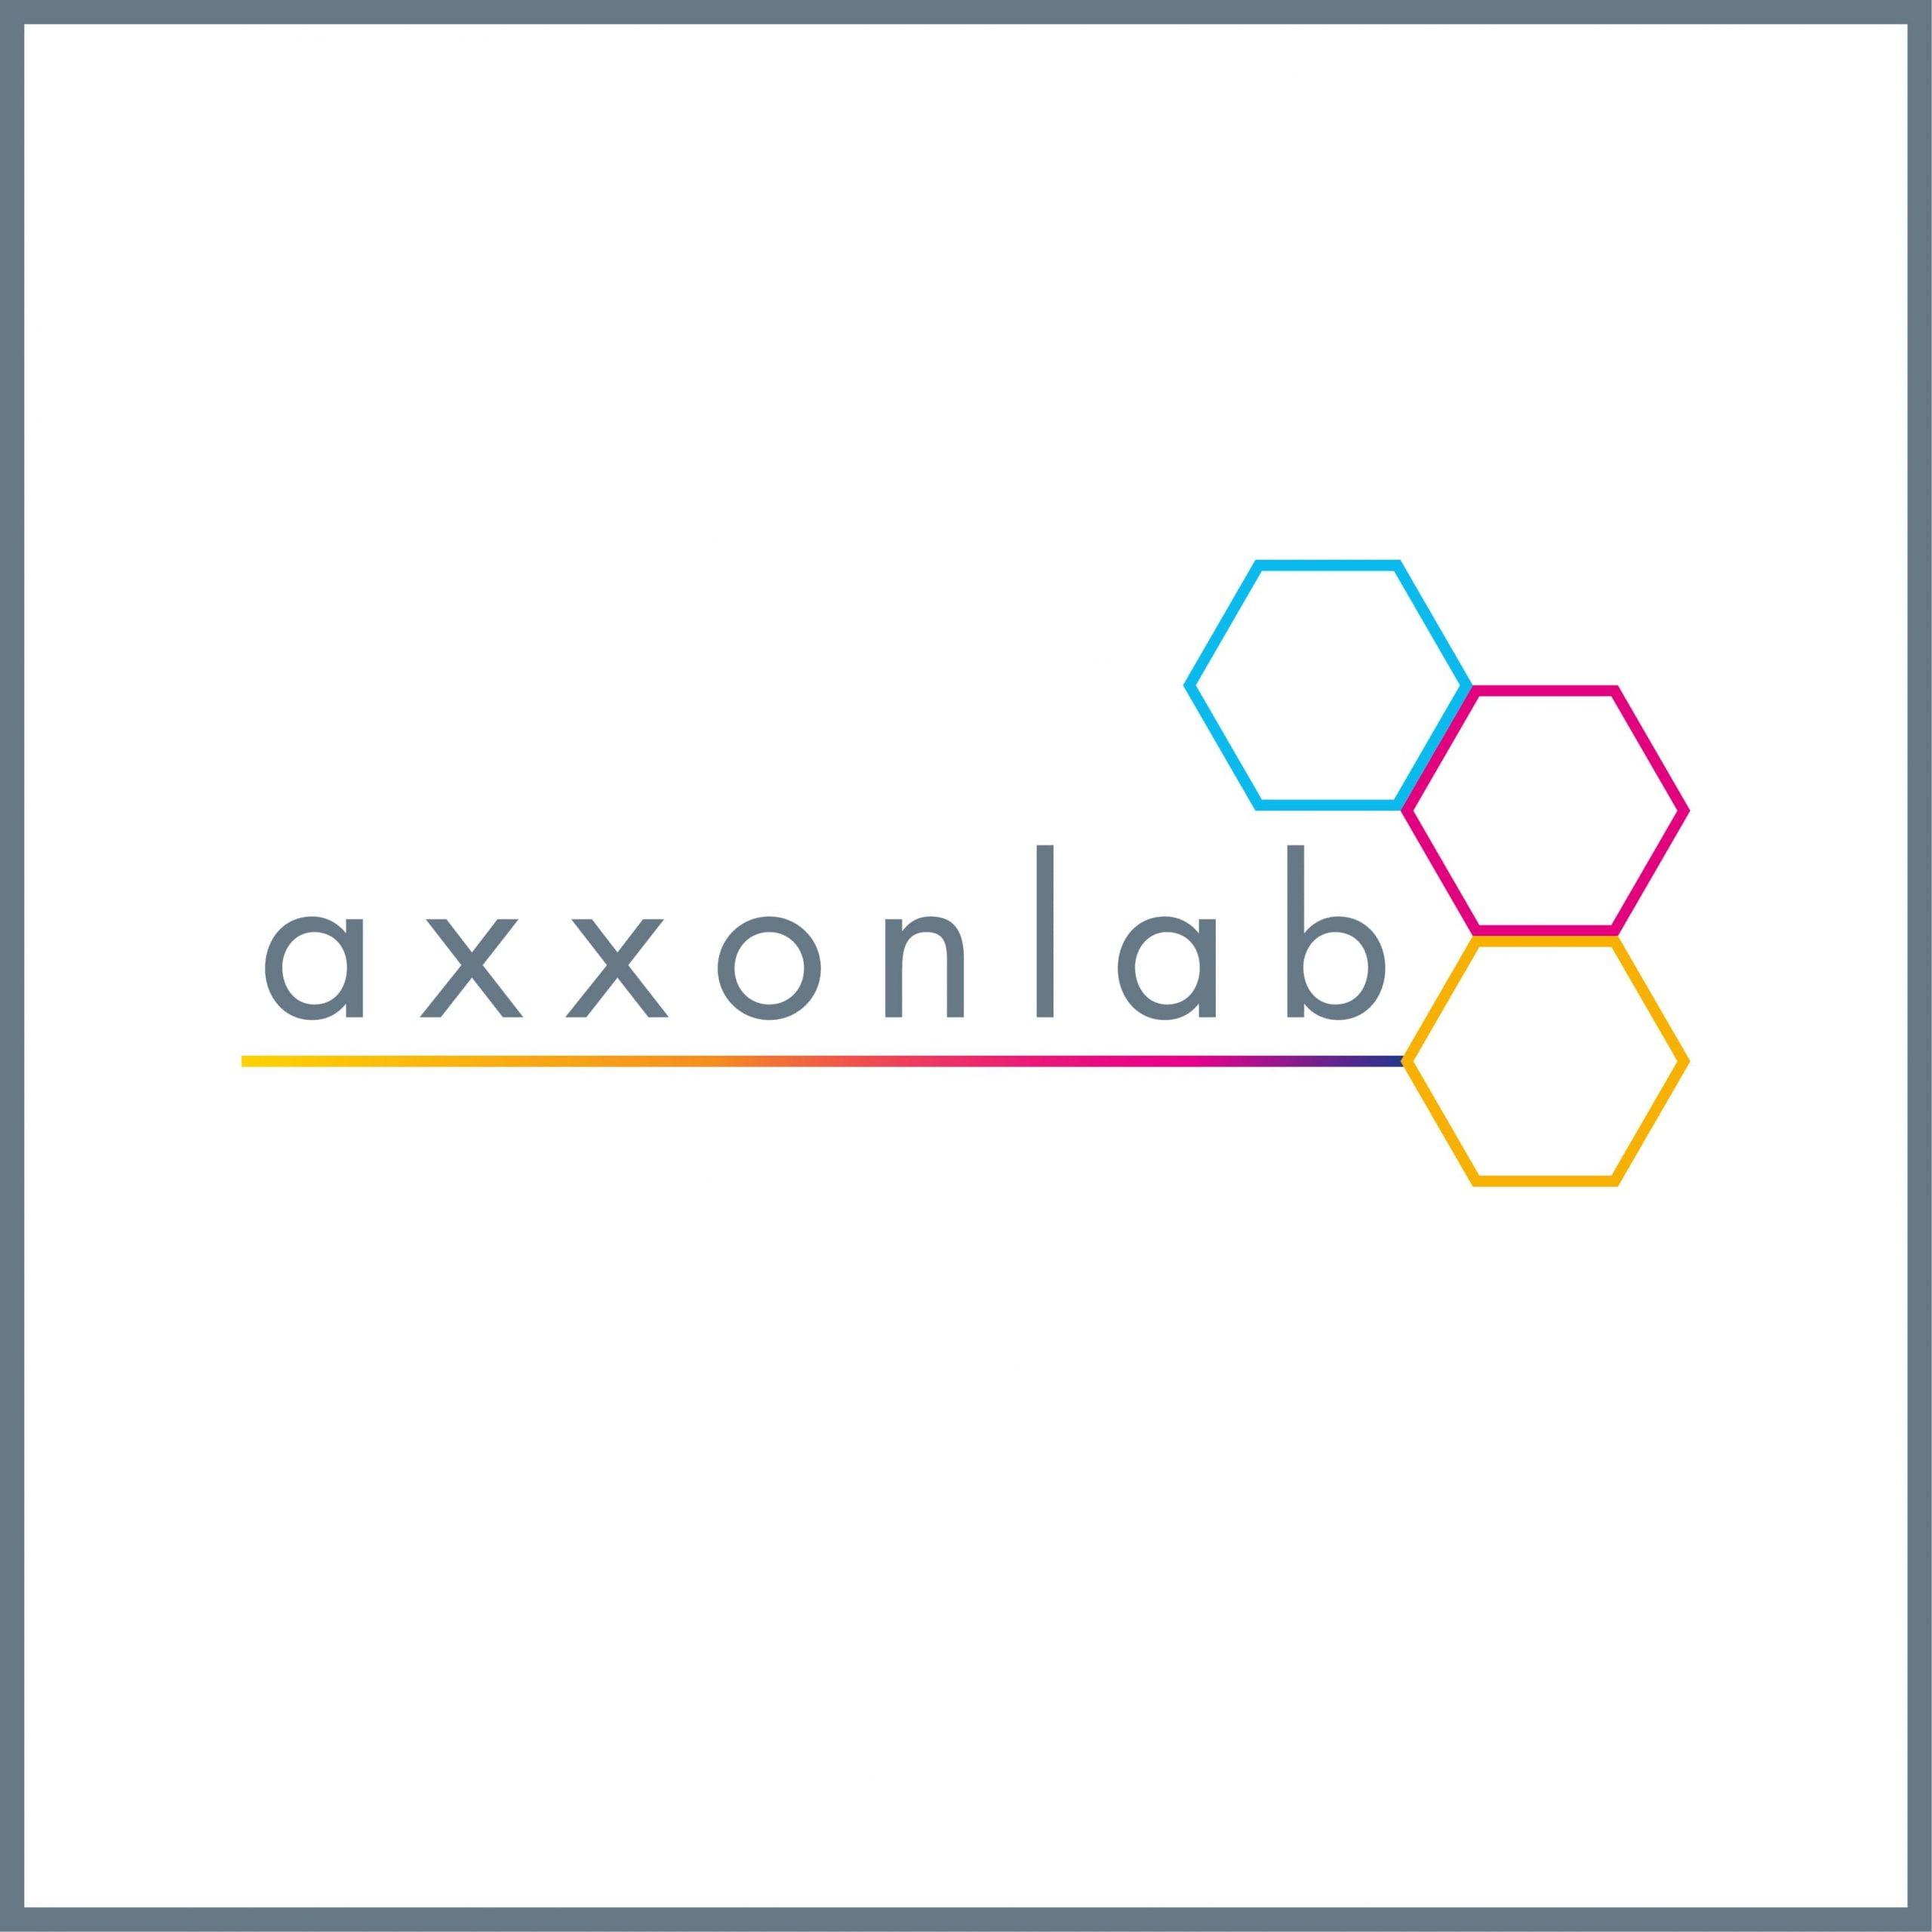 Axxonlab - Modernisation de logo